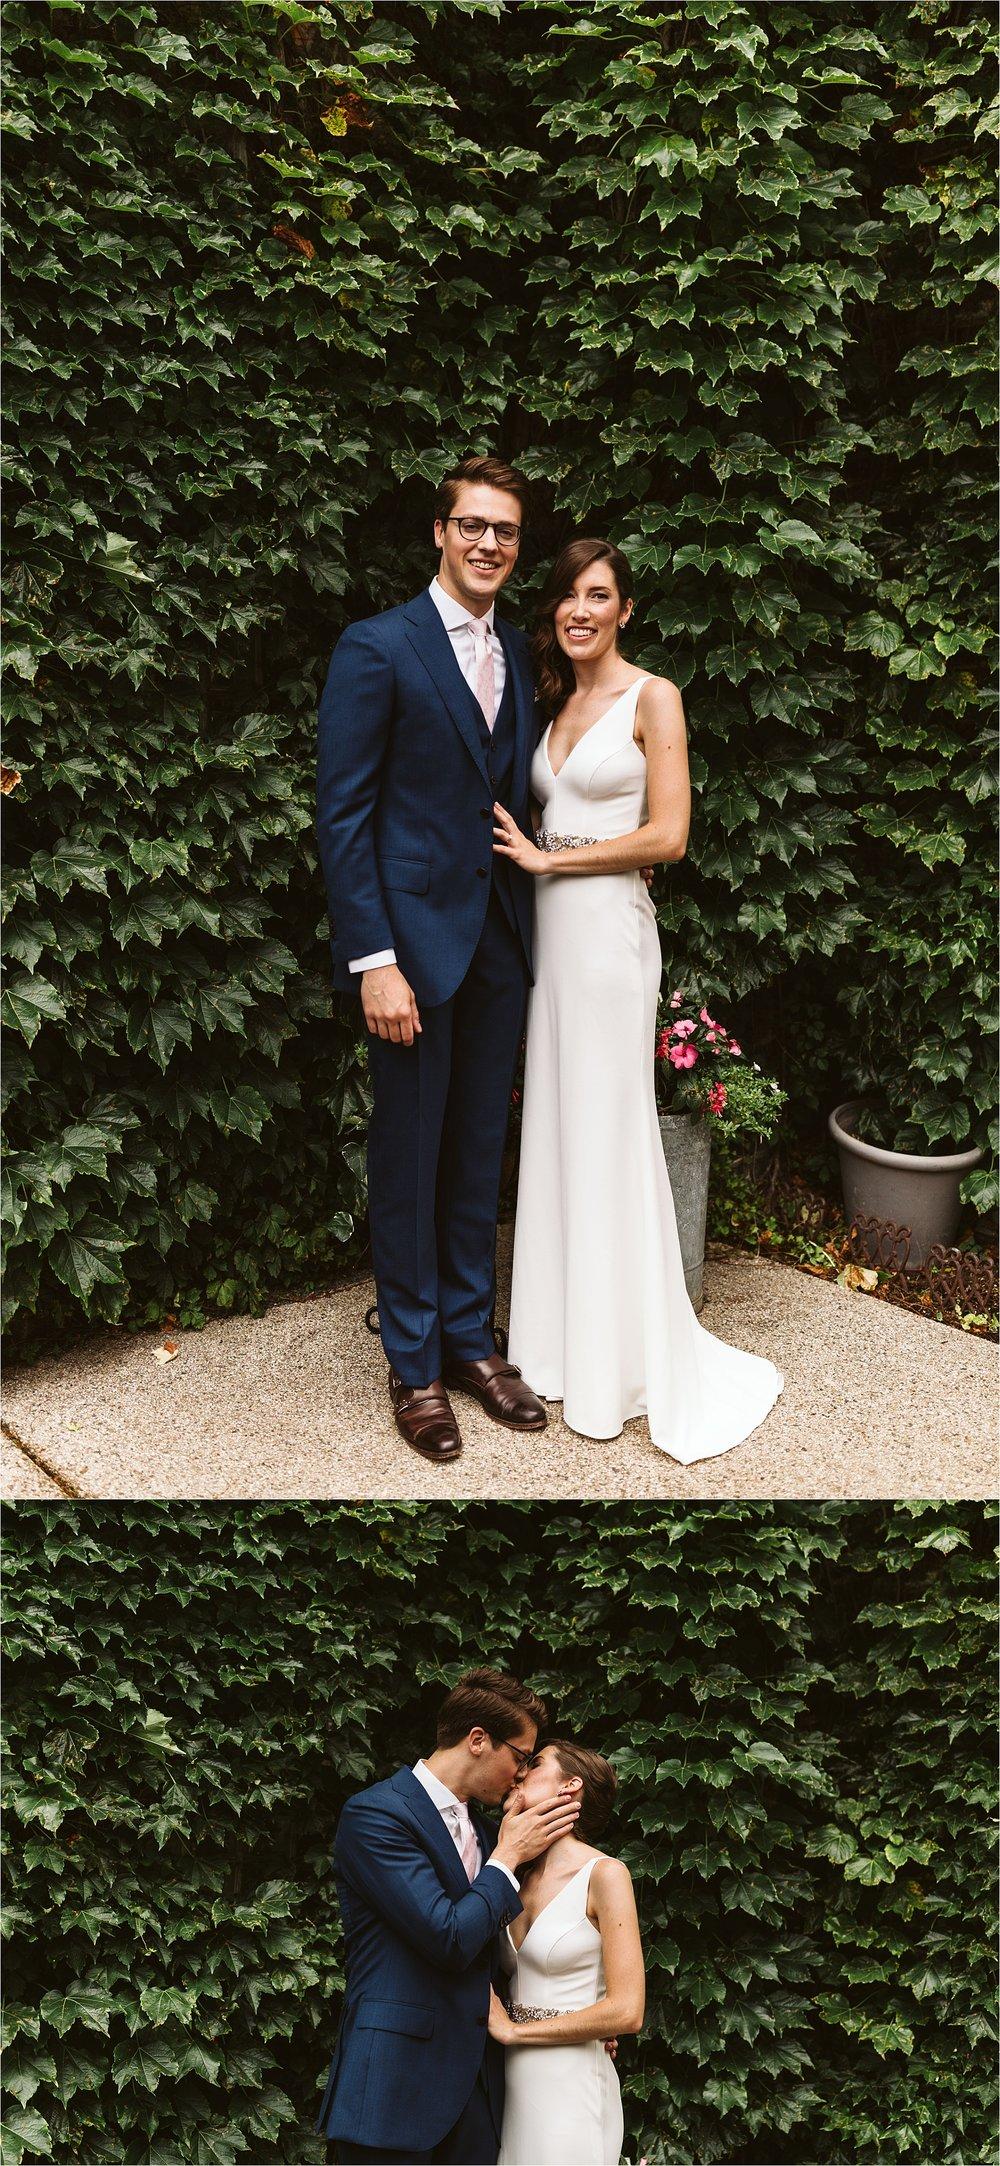 Intimate Firehouse Chicago Wedding_0016.jpg